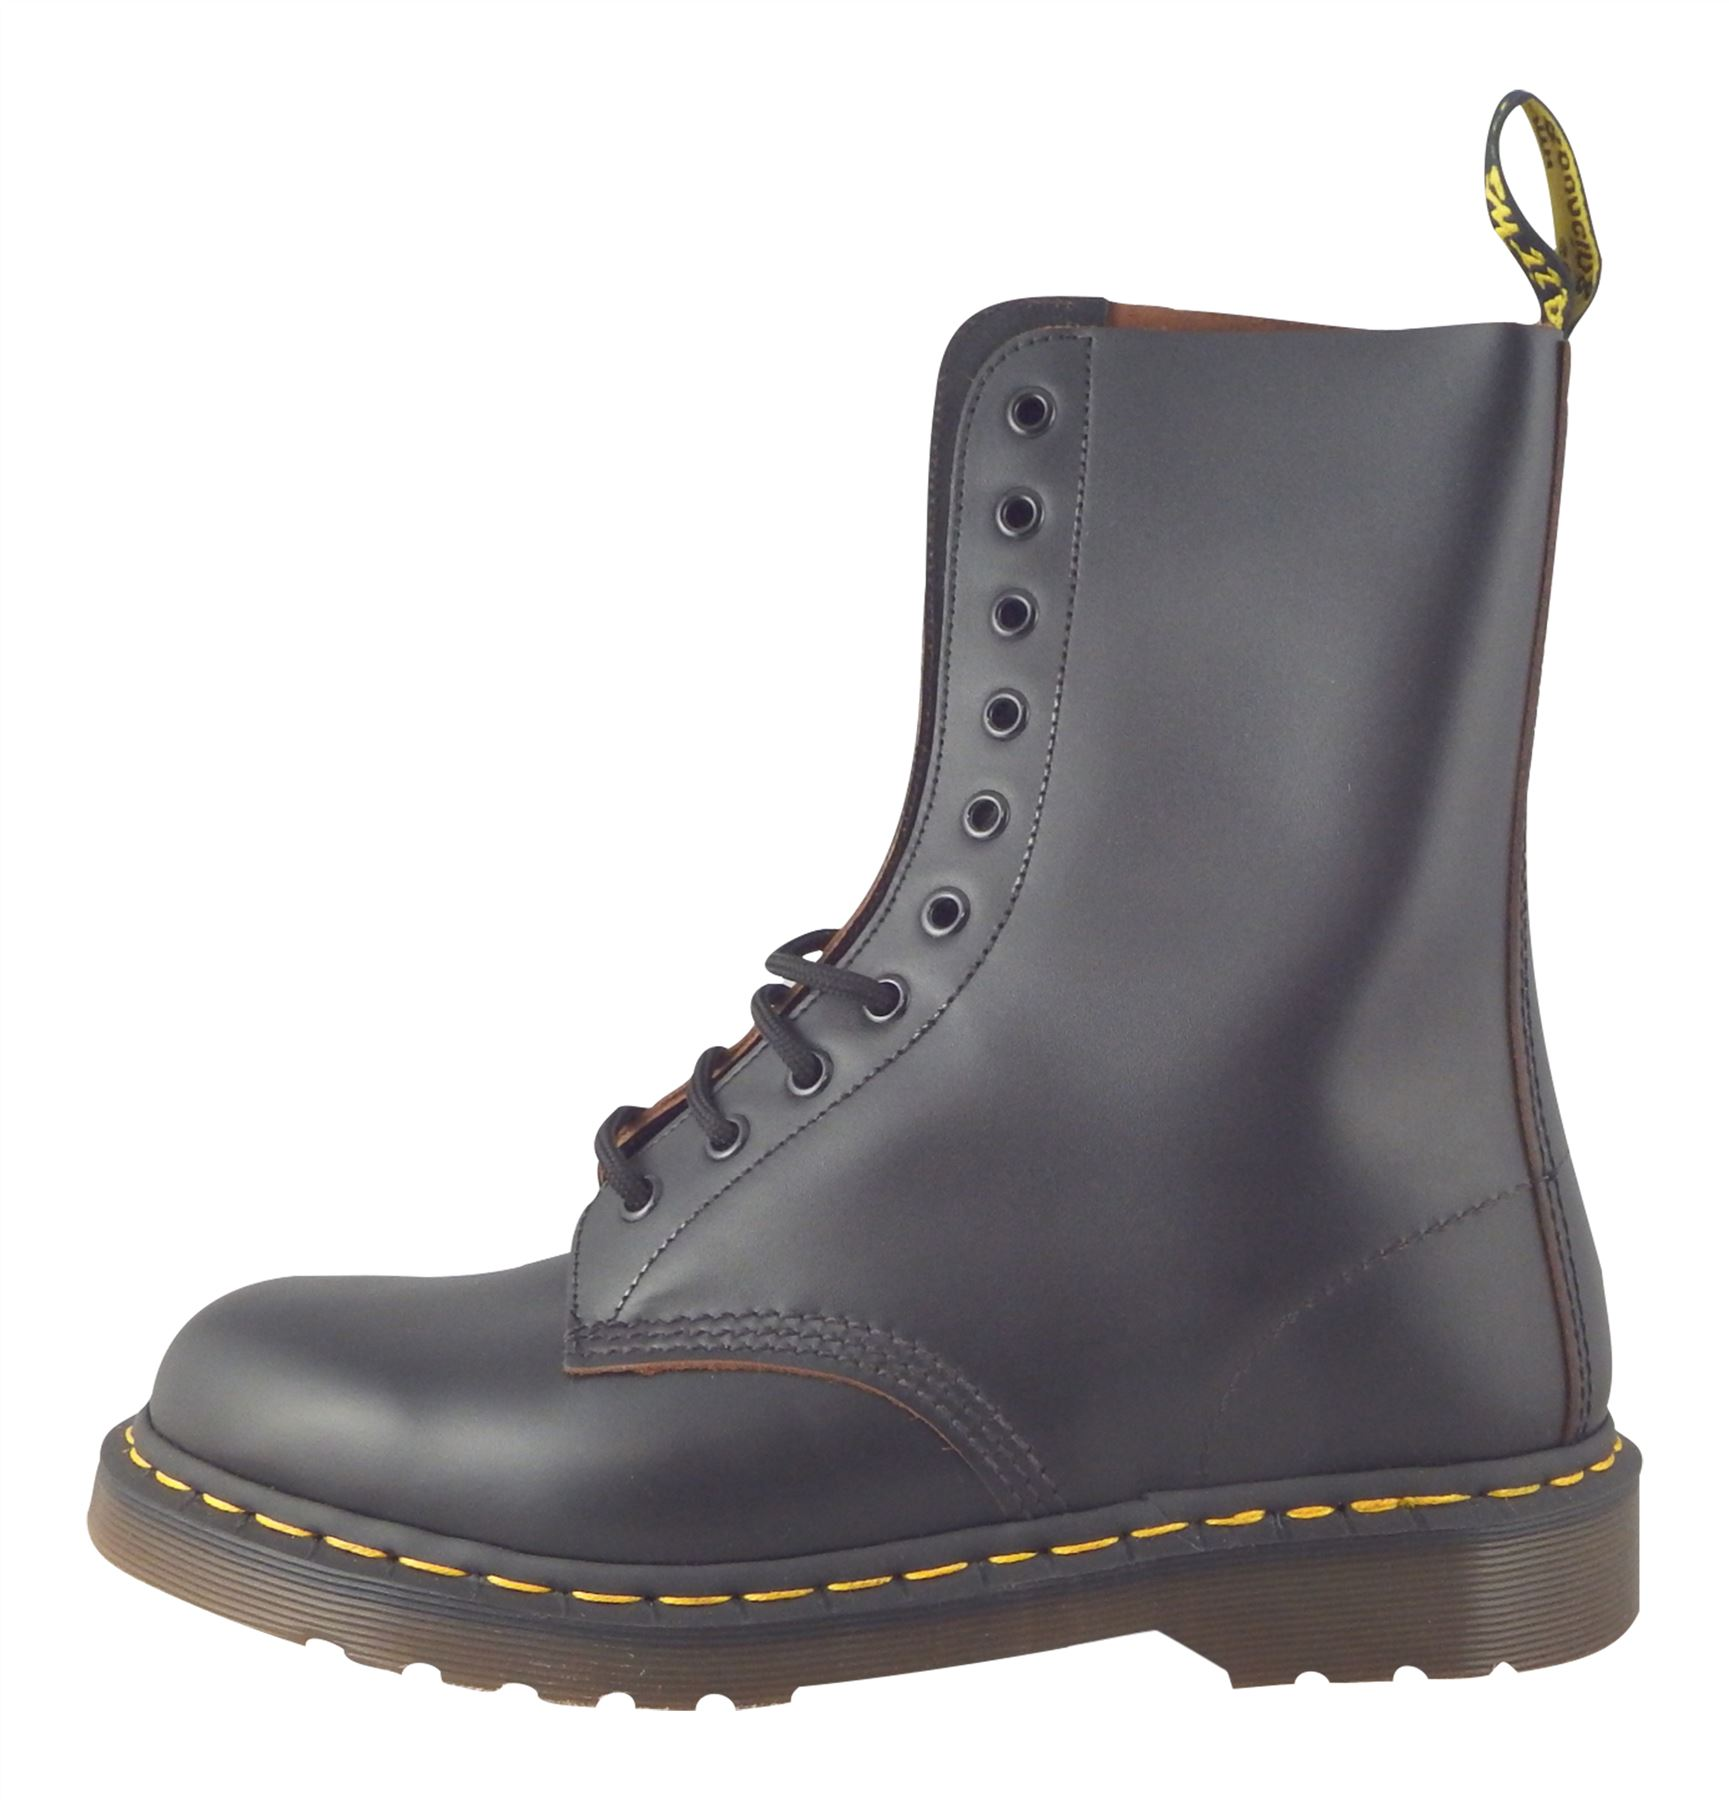 wo zu kaufen bester Wert größter Rabatt Details about Dr Martens 1490 Made In England MIE Black Quilon Leather  Ankle Doc Boots